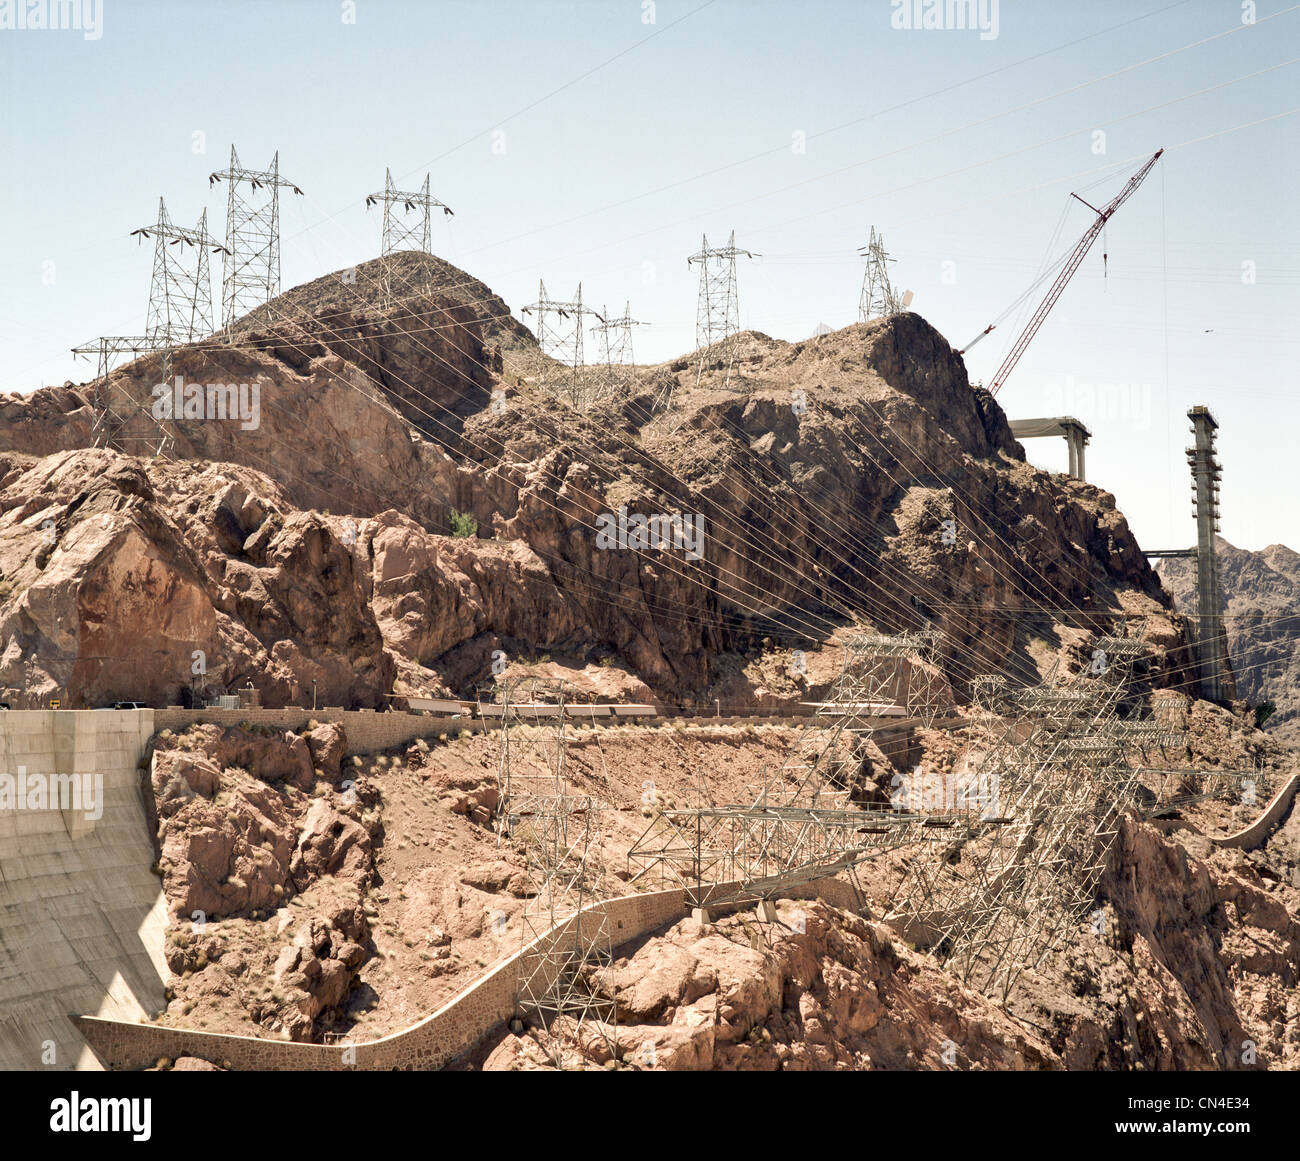 Hoover dam under construction, Nevada, USA - Stock Image